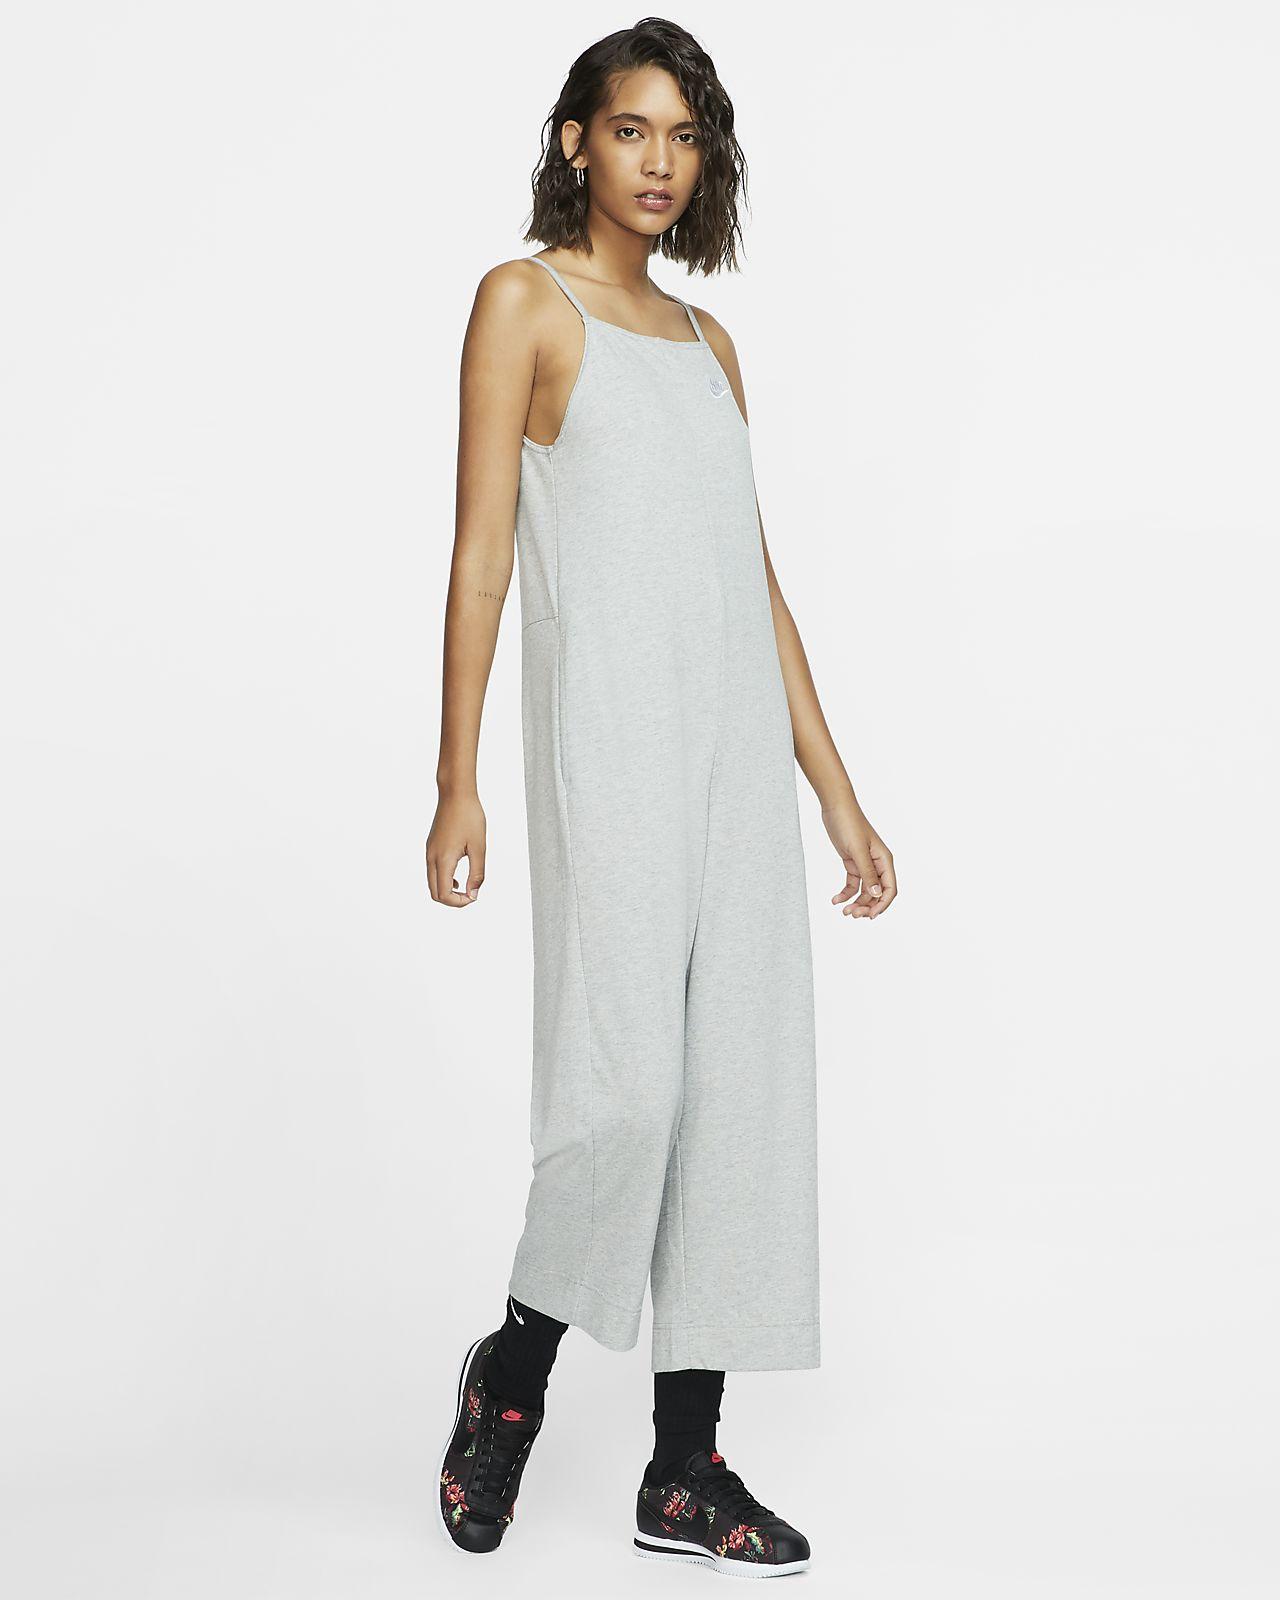 Combinaison Nike Sportswear pour Femme